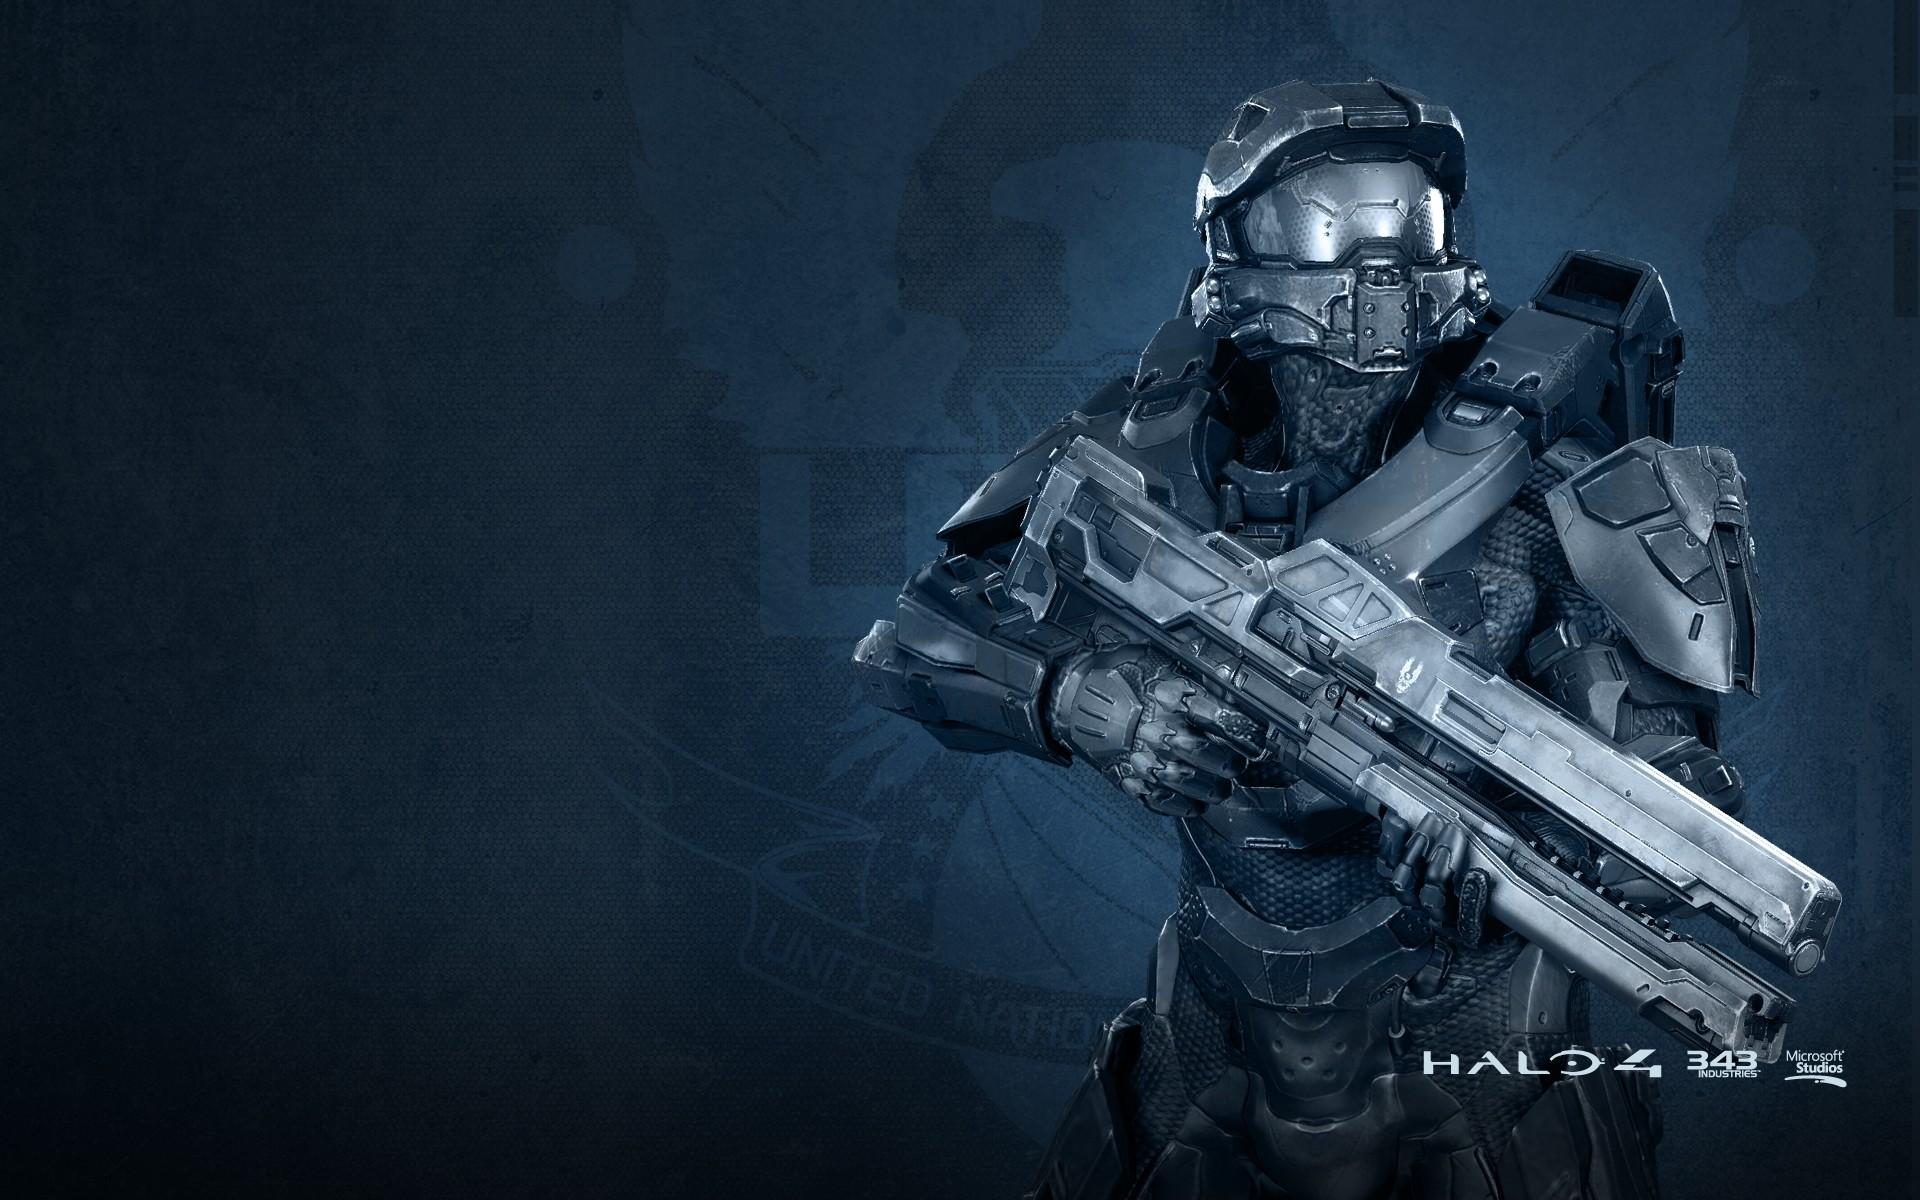 Wallpaper Halo 4 Master Chief Chief Master Halo Games PicsFab 1920x1200